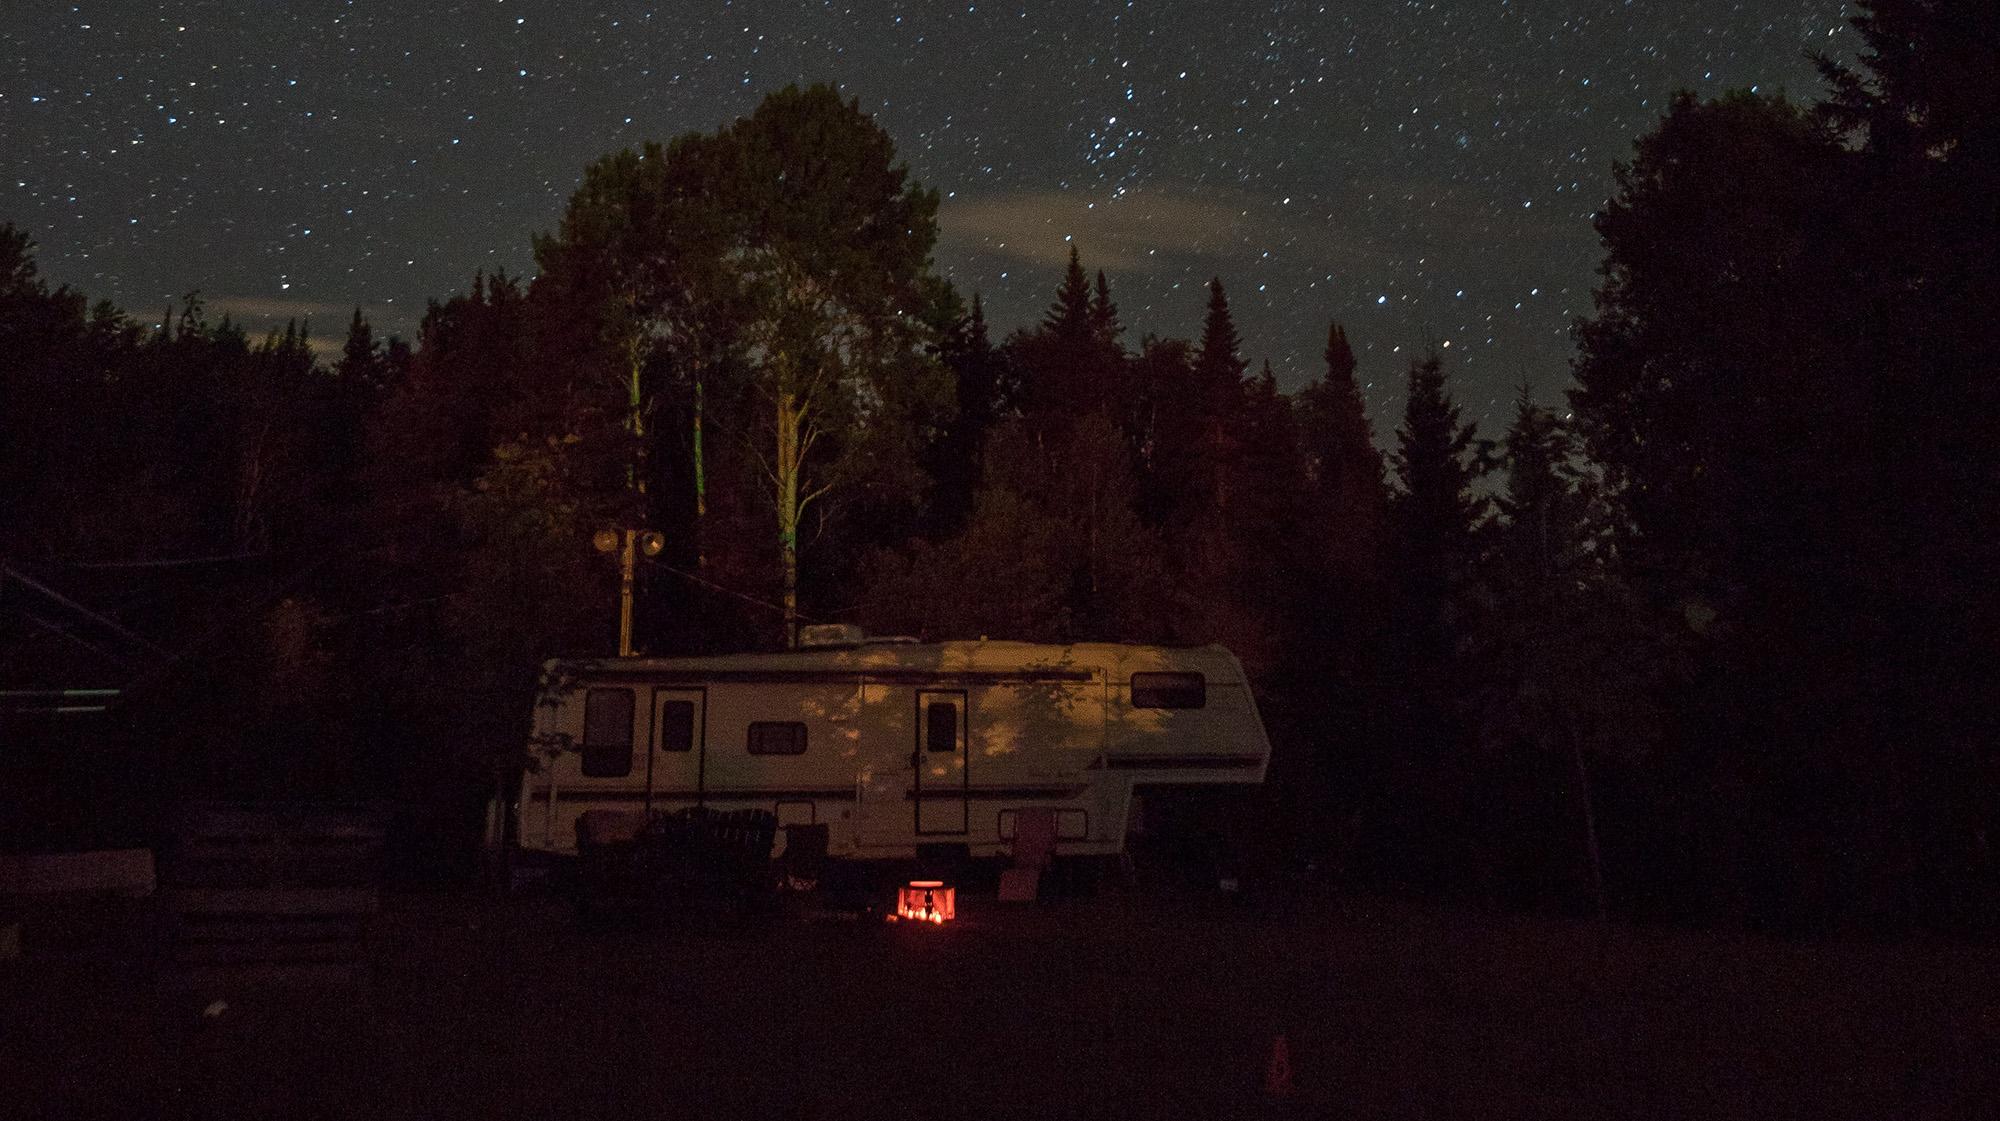 Fifth-wheel trailer under starry sky.